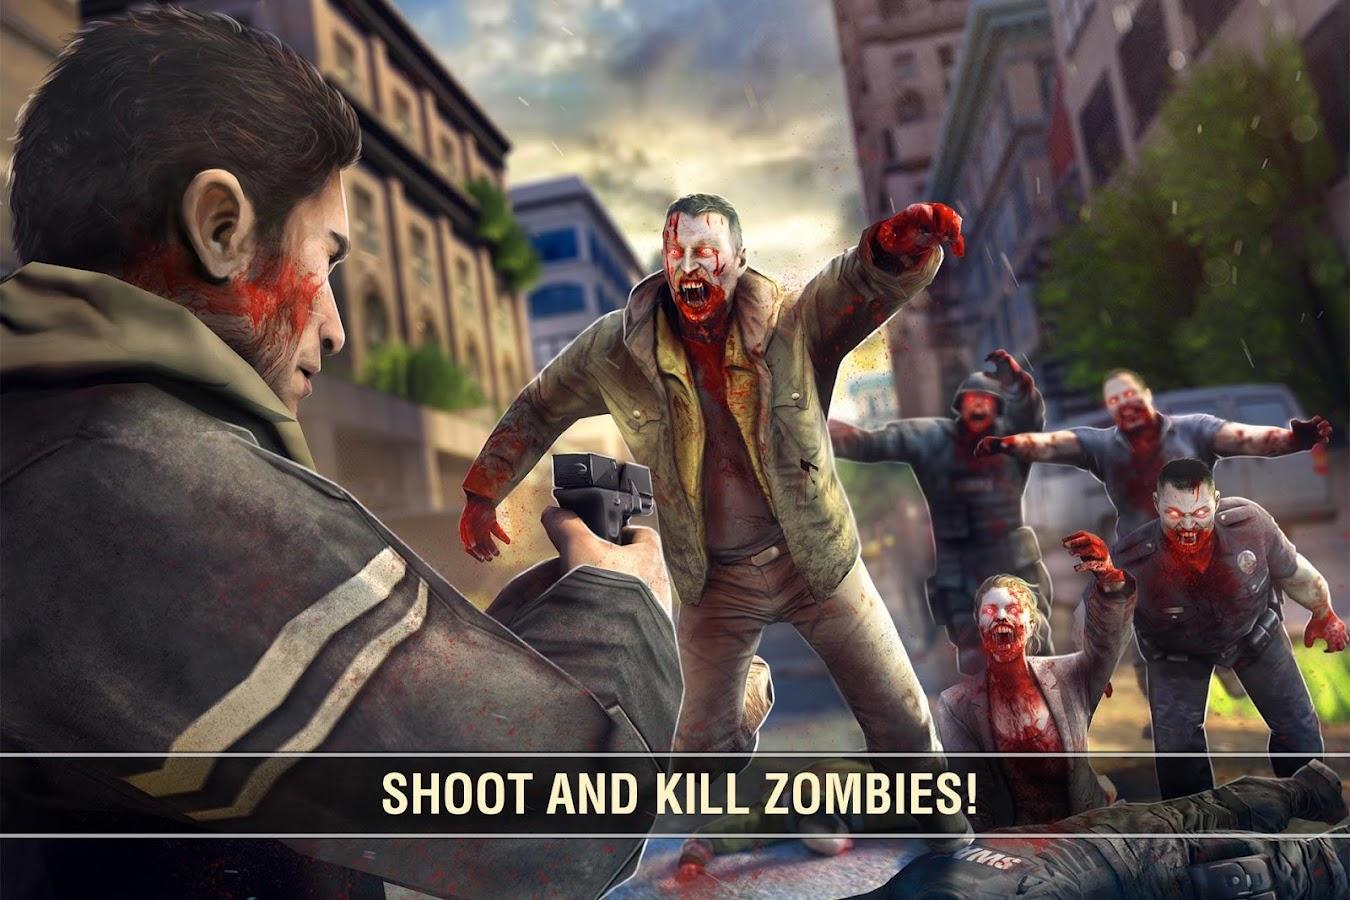 dead trigger 2 mod apk download 1.3.1